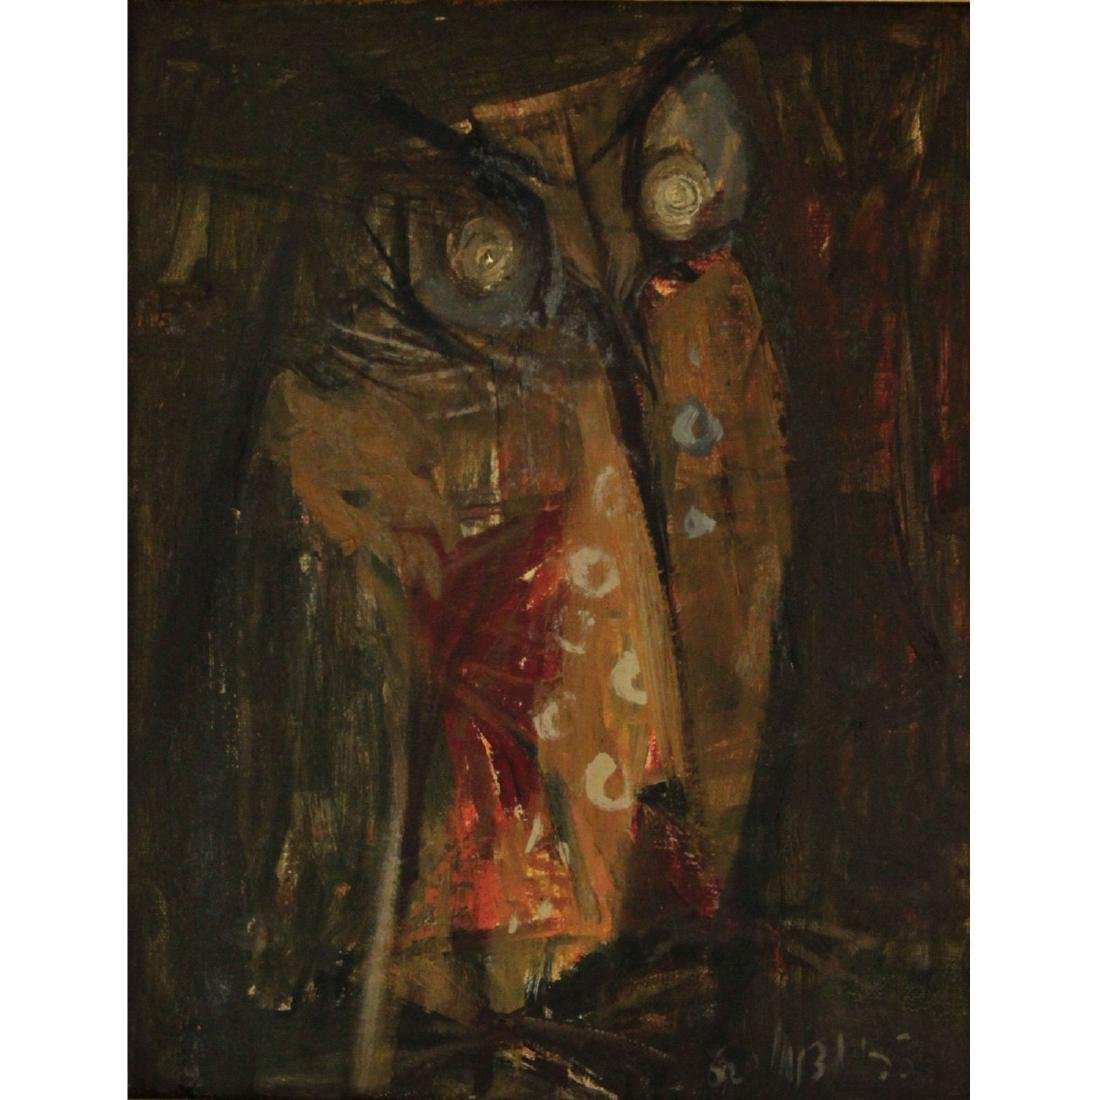 Zvi Tadmor (1923-2012) - Owl, Oil on Canvas, 1960.